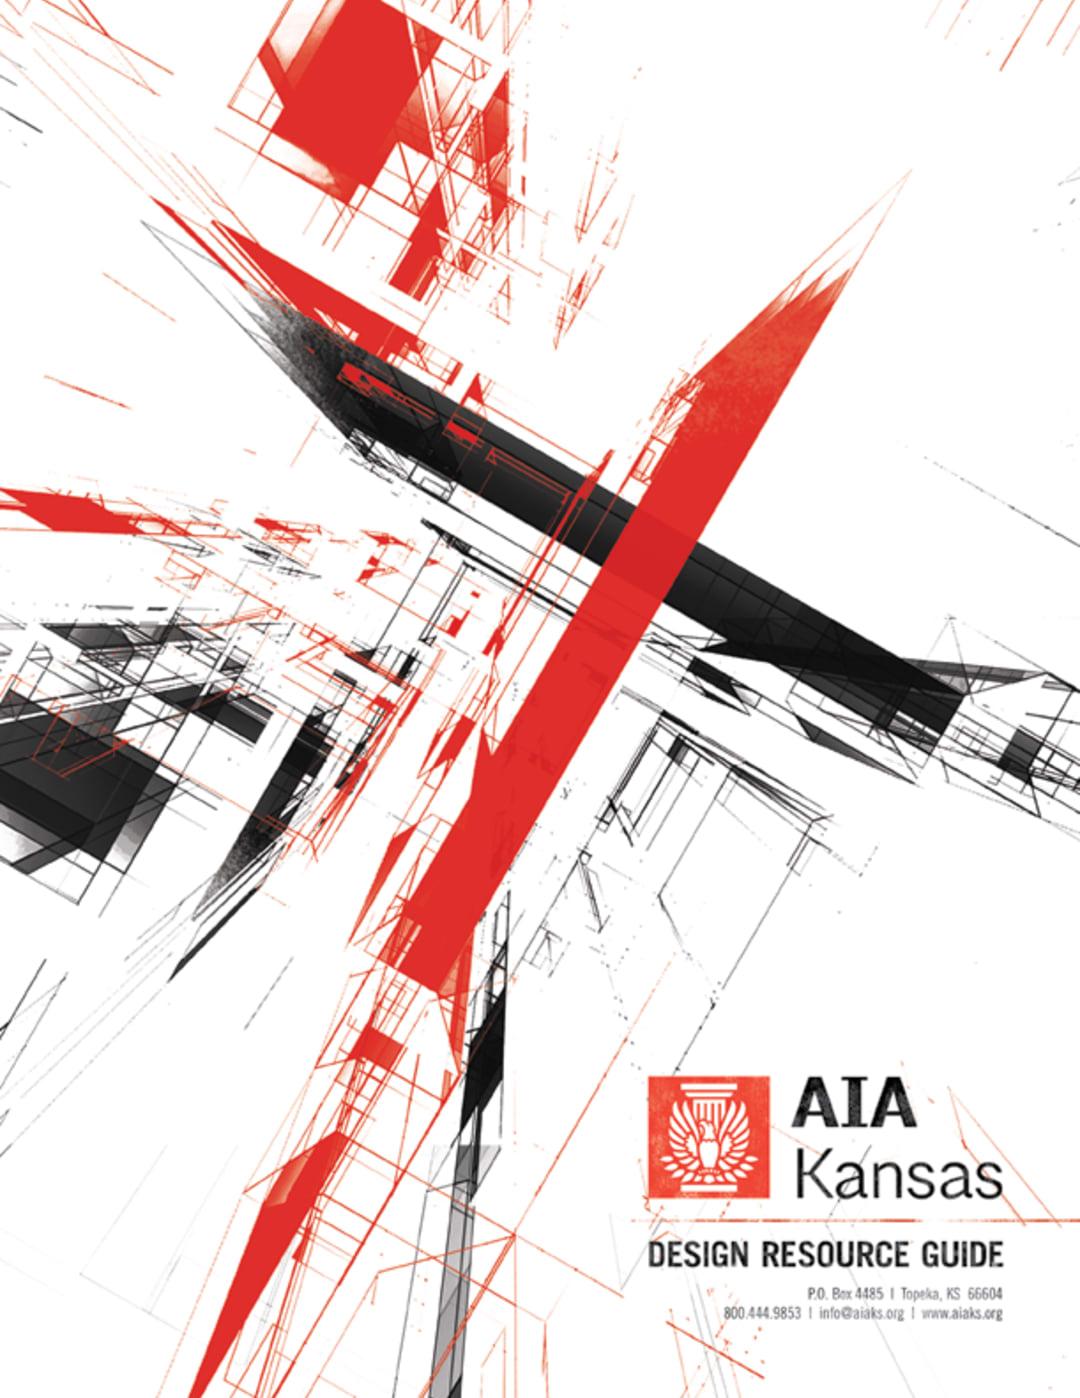 AIAKansas18_COVS